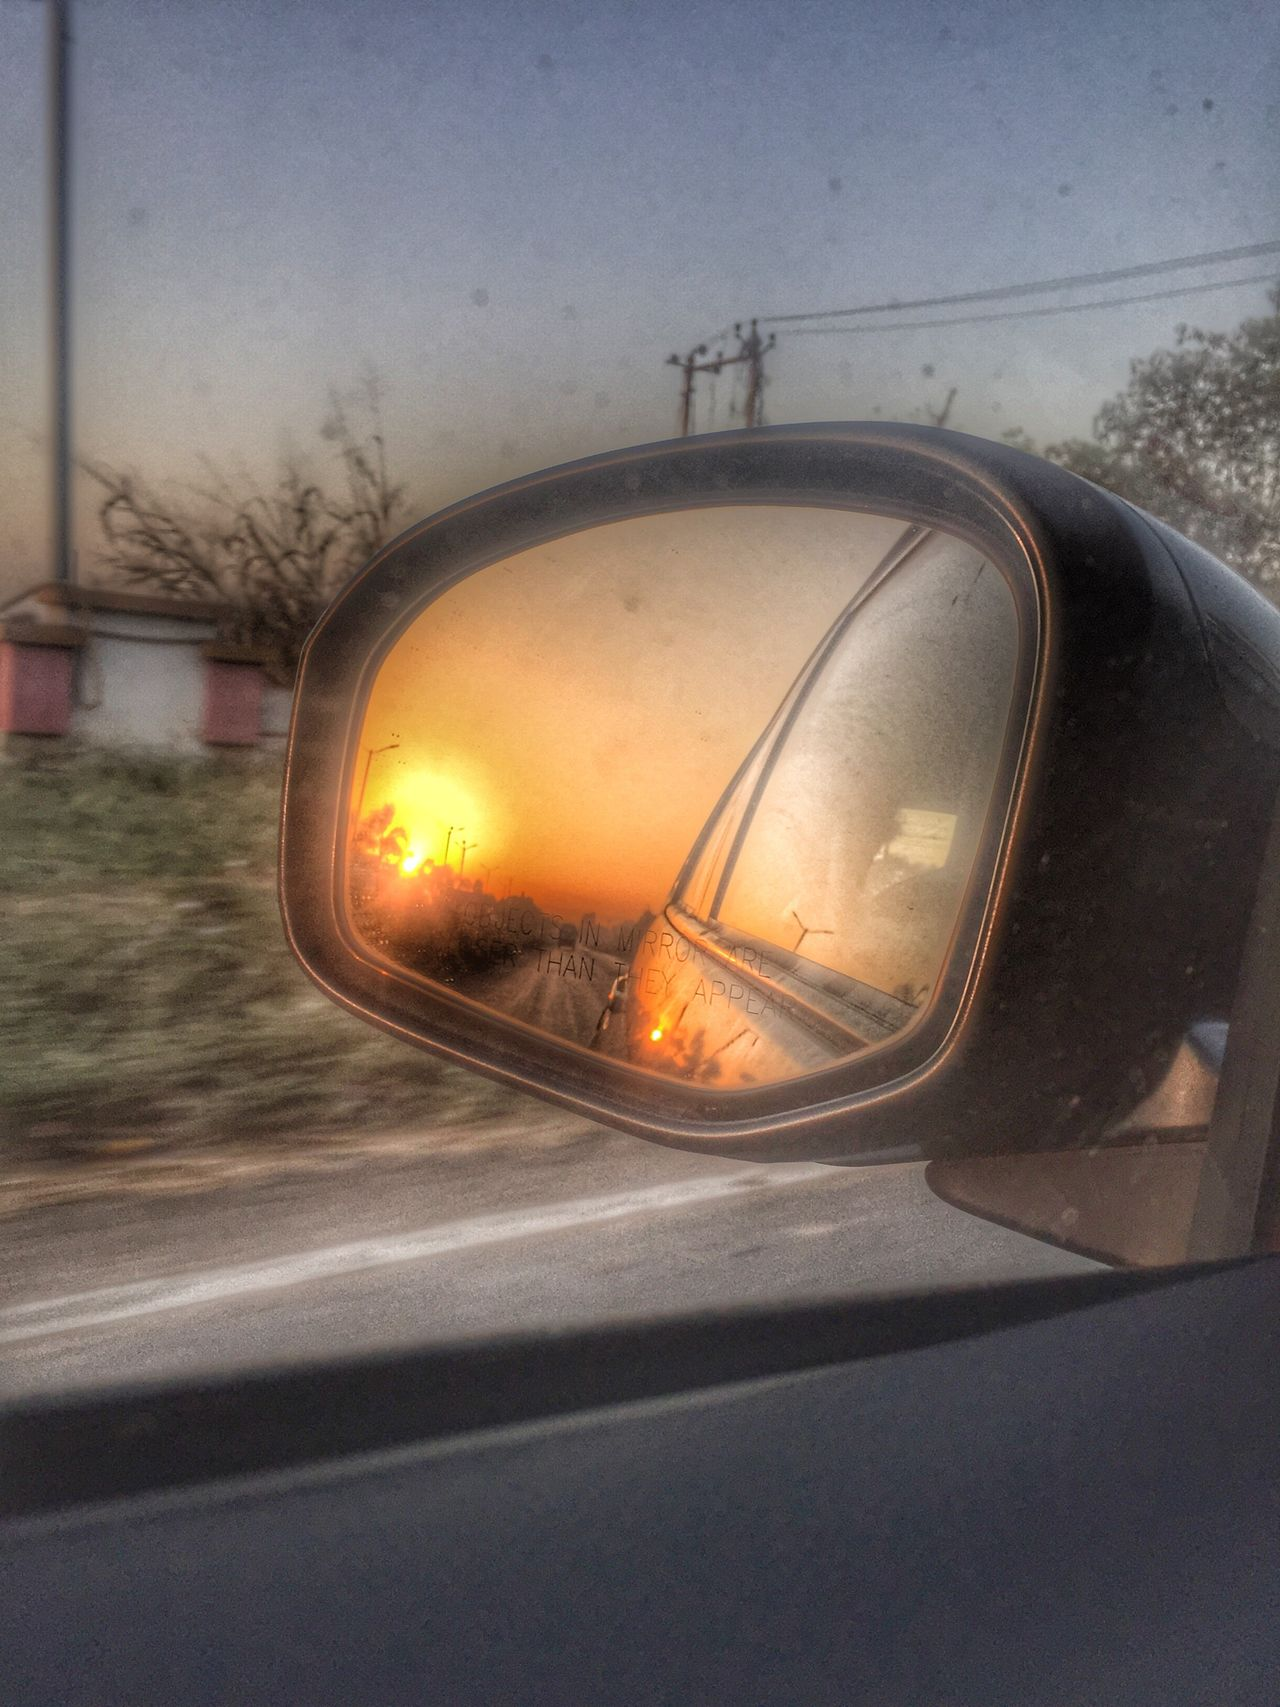 Sunshine ☀️ tTransportationcCarlLand VehiclerReflectionrRoadsSide-view MirrormMode Of TransportvVehicle MirrorjJourneysSunsetnNo PeoplesSkycClose-updDaynNatureoOutdoors